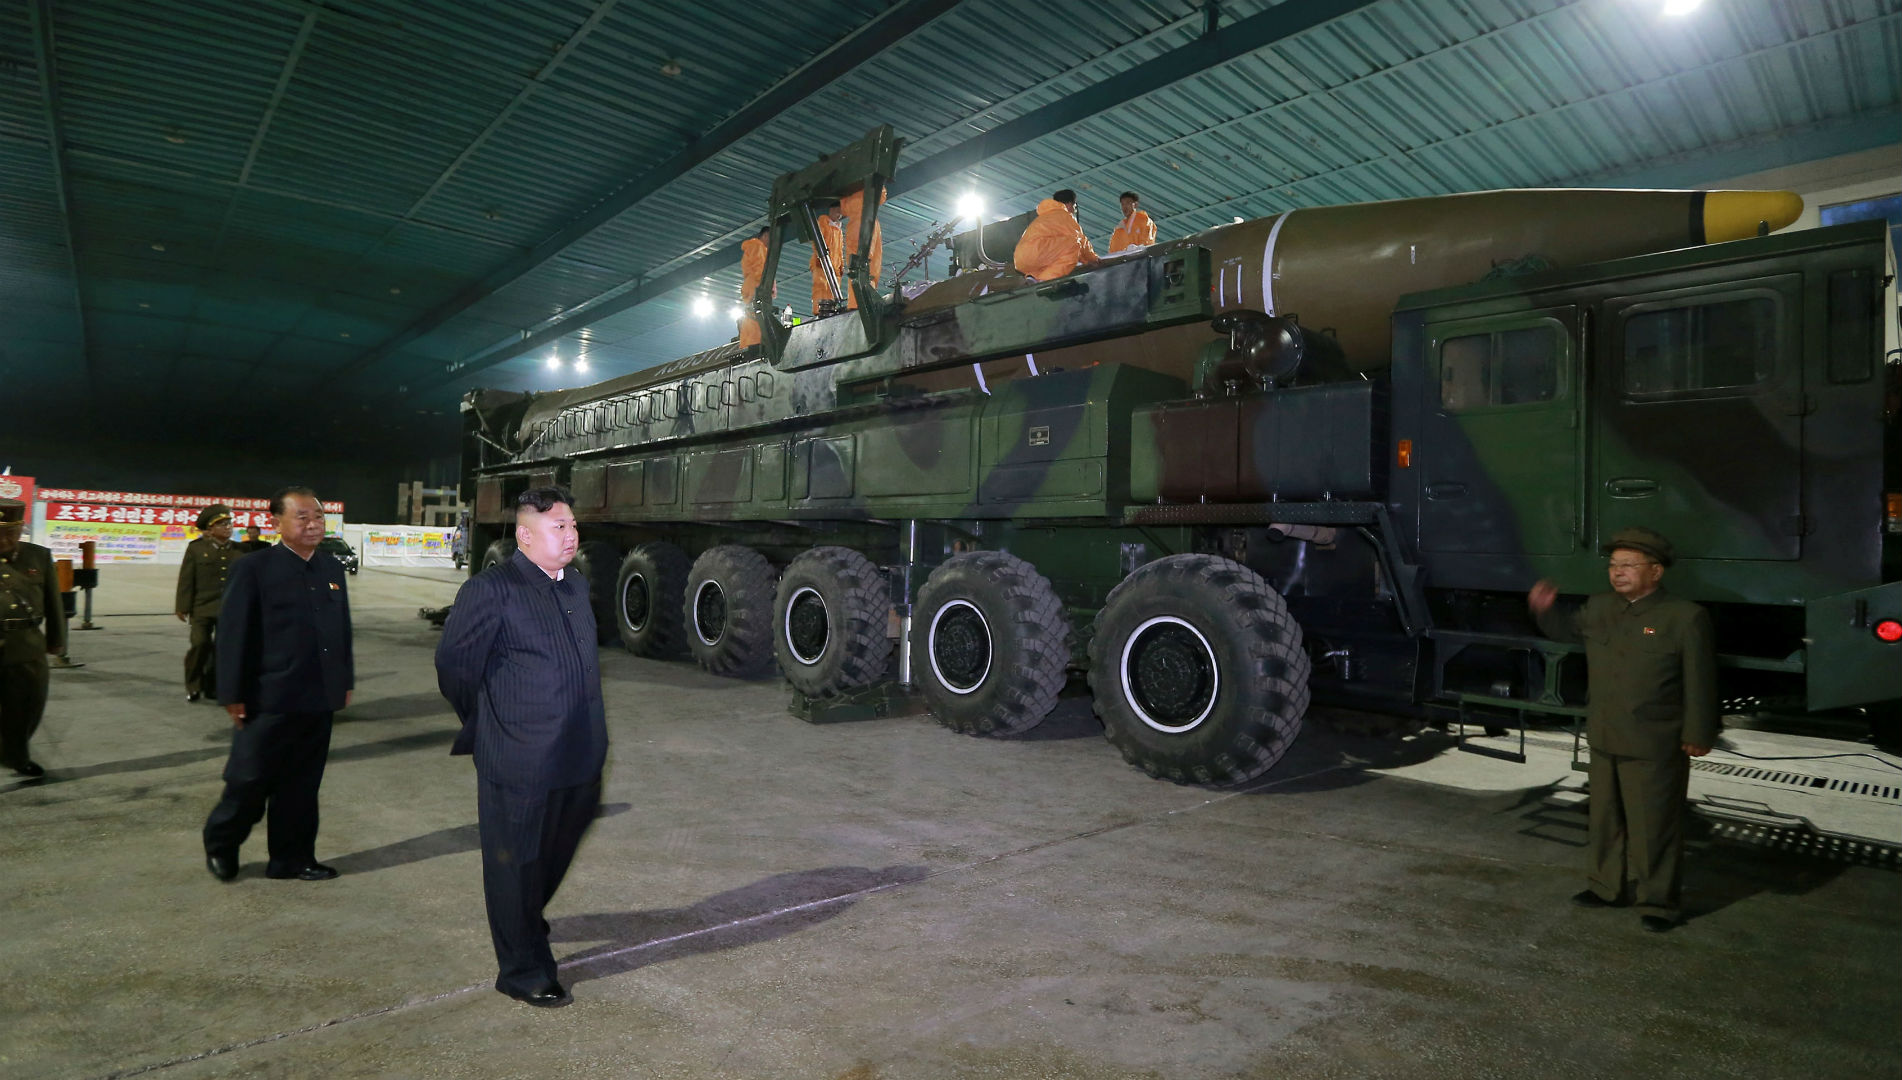 Kim Jong-un demostró su capacidad nuclear a diputados rusos